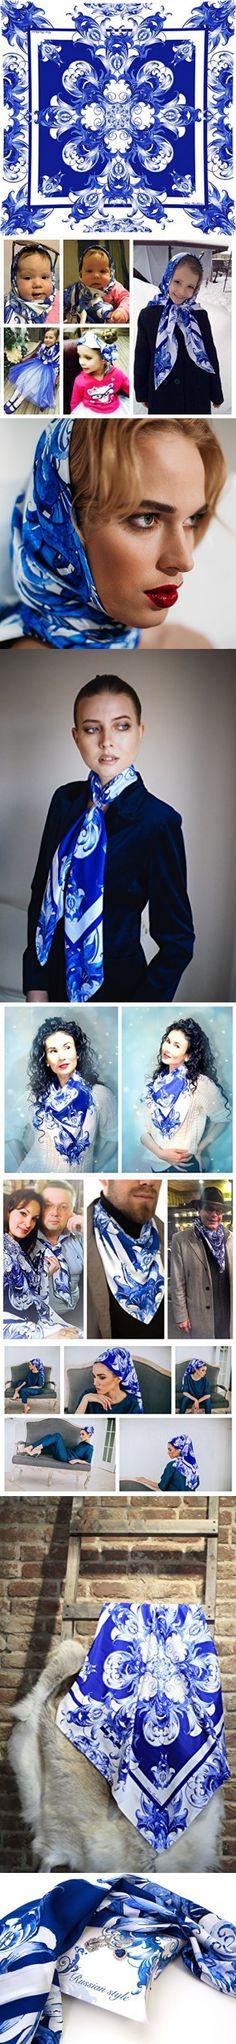 Chevron scarf Fashion Exclusive Designer Silk Scarf Shawl For Men & Women Premium Handmade Pashmina Gzhel Perfect As Bandana Headband Shawl Wrap Or Neckerchief Scarf